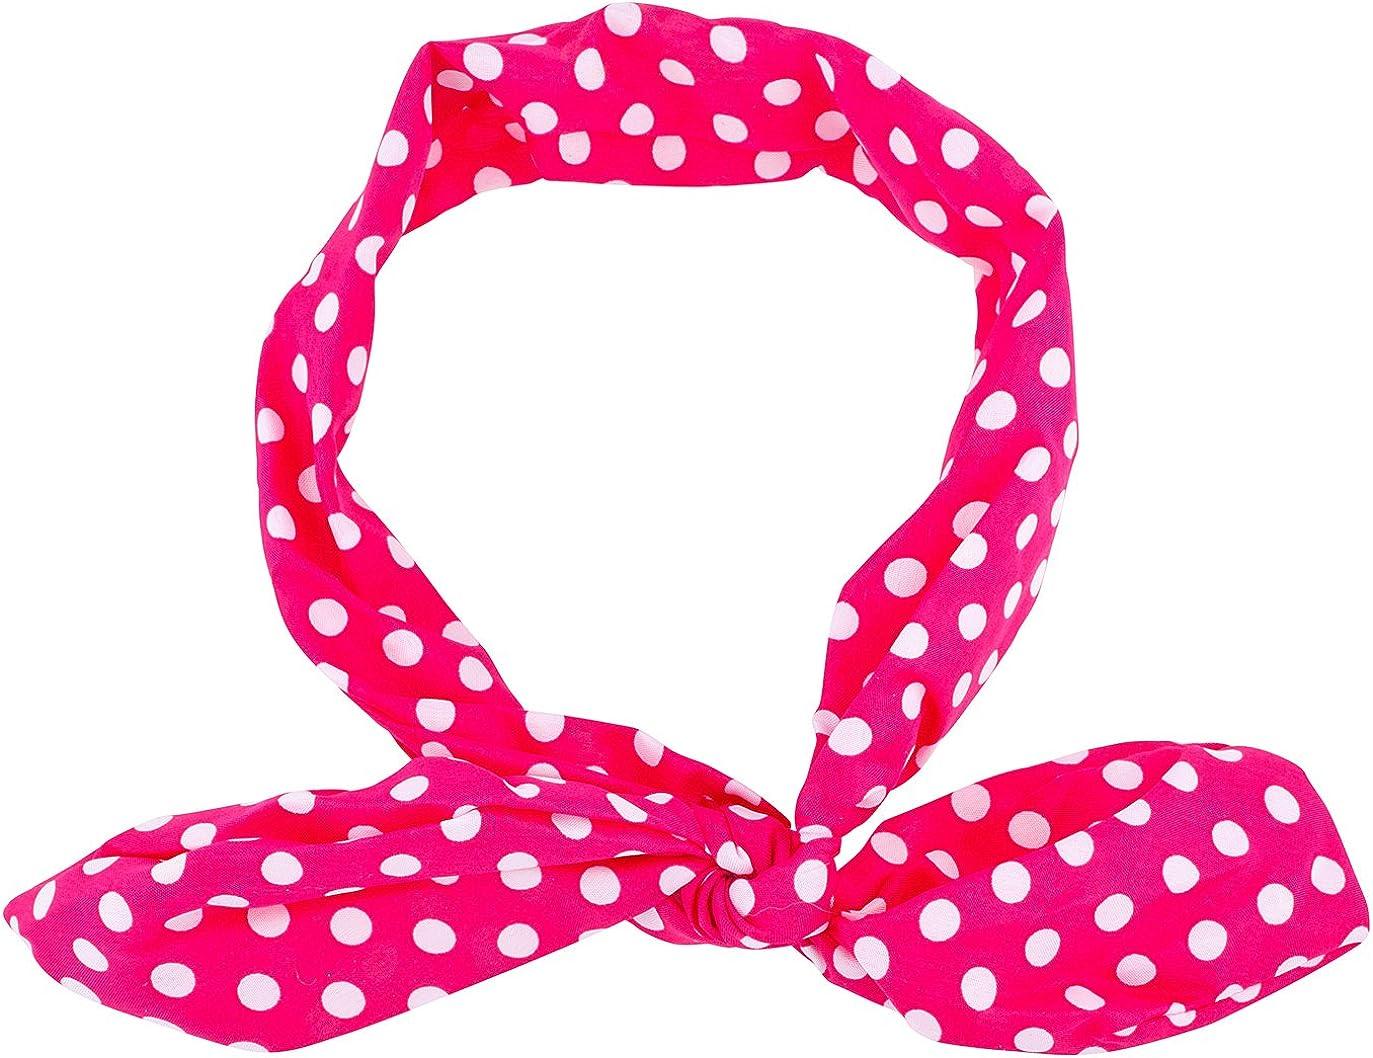 Lux Accessories Classic Polka Dot Chiffon Pin Up Girl HeadTie Scarf Headband